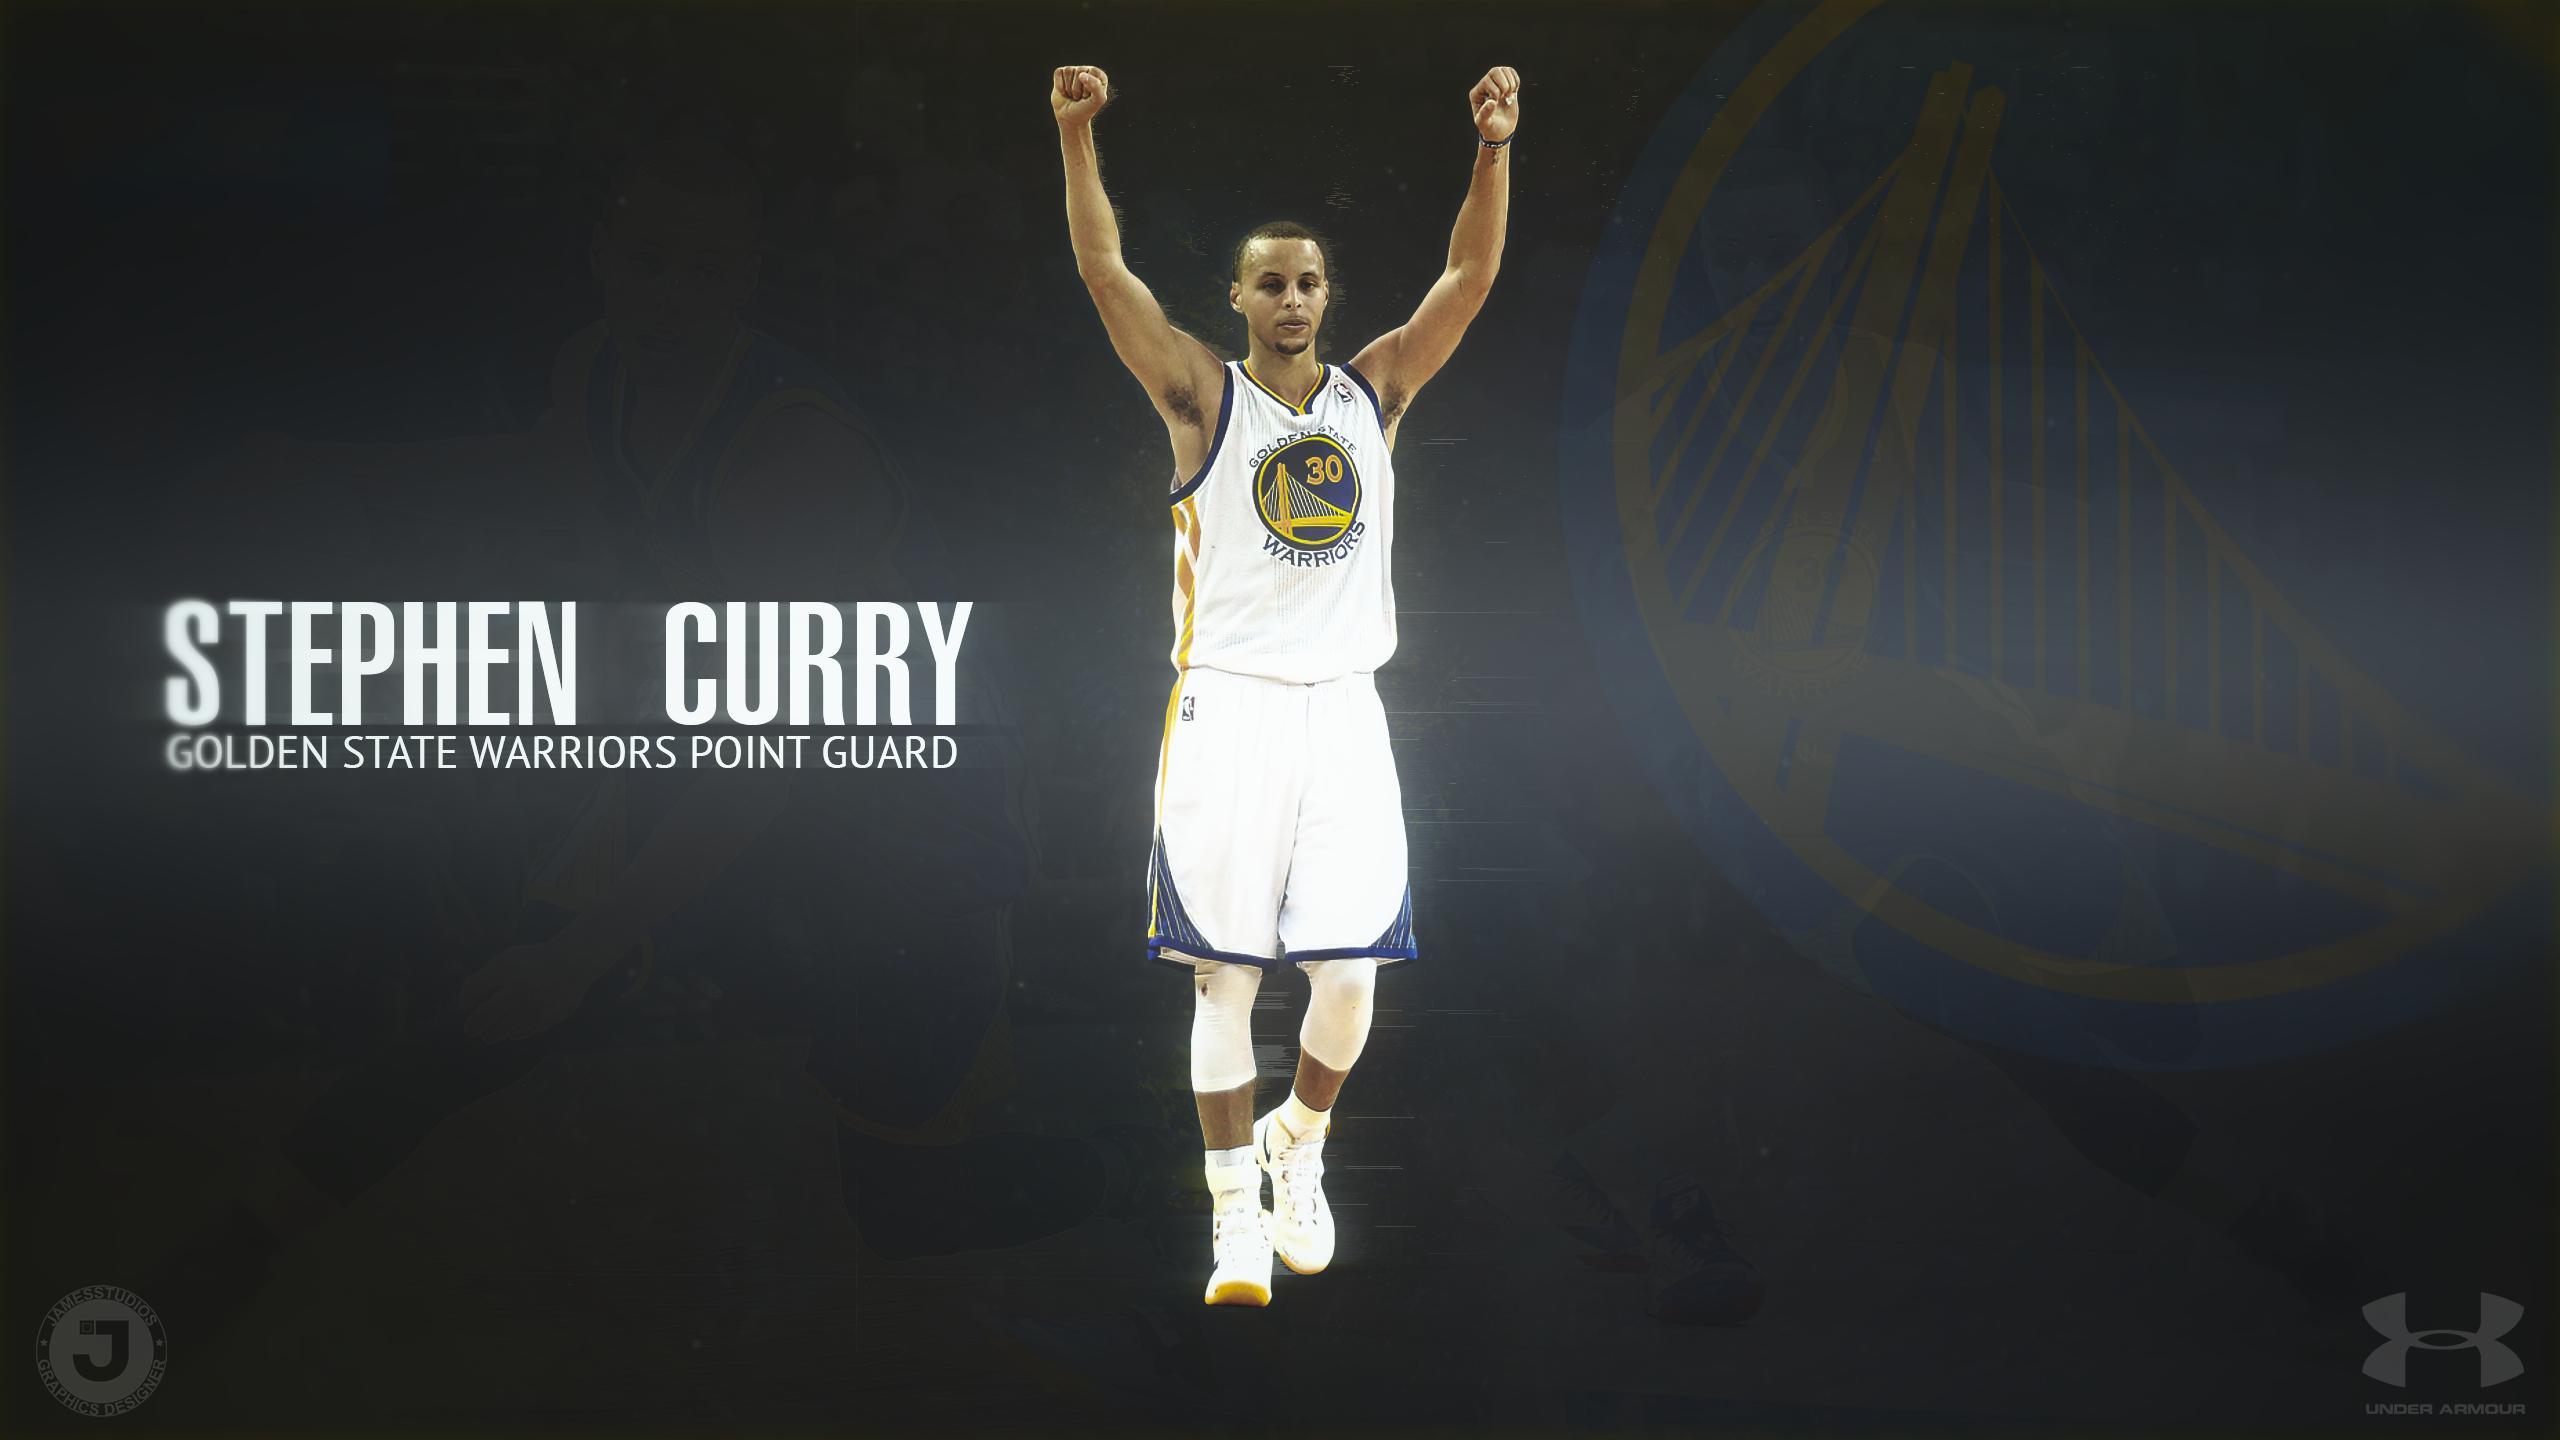 Stephen Curry Desktop Wallpaper by JamesSStudios Stephen Curry Desktop 2560x1440